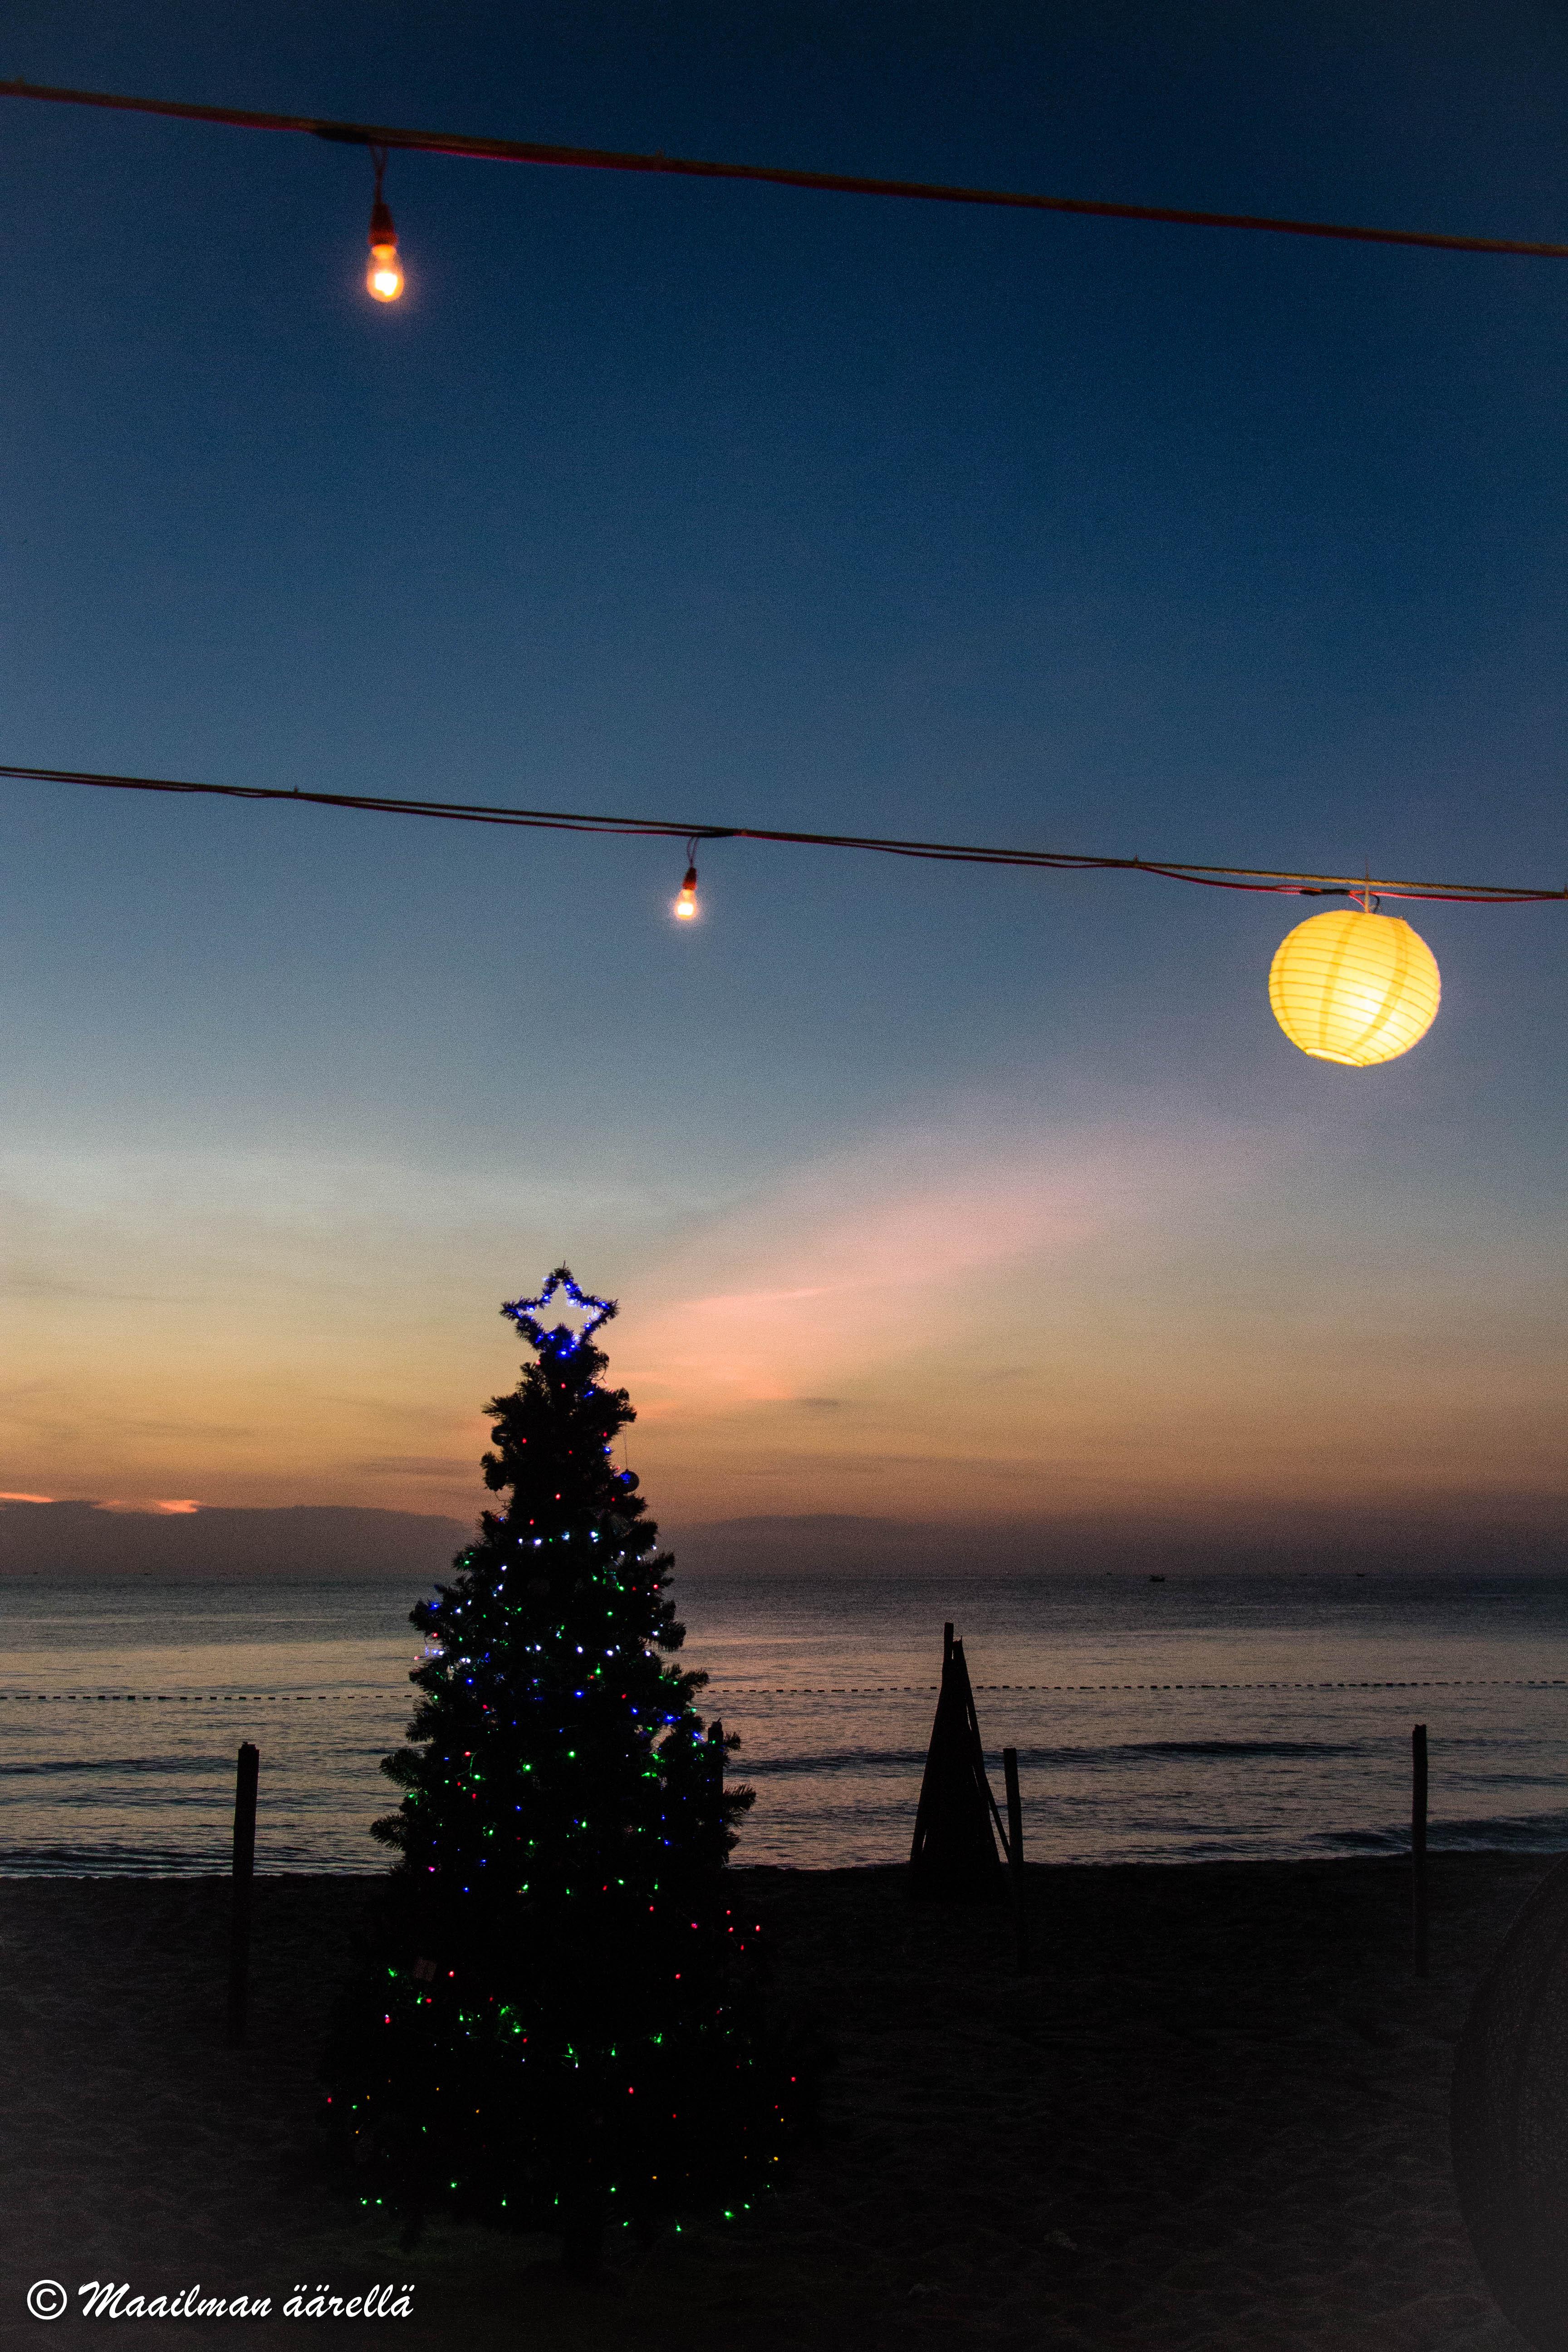 Phu Quock joulu